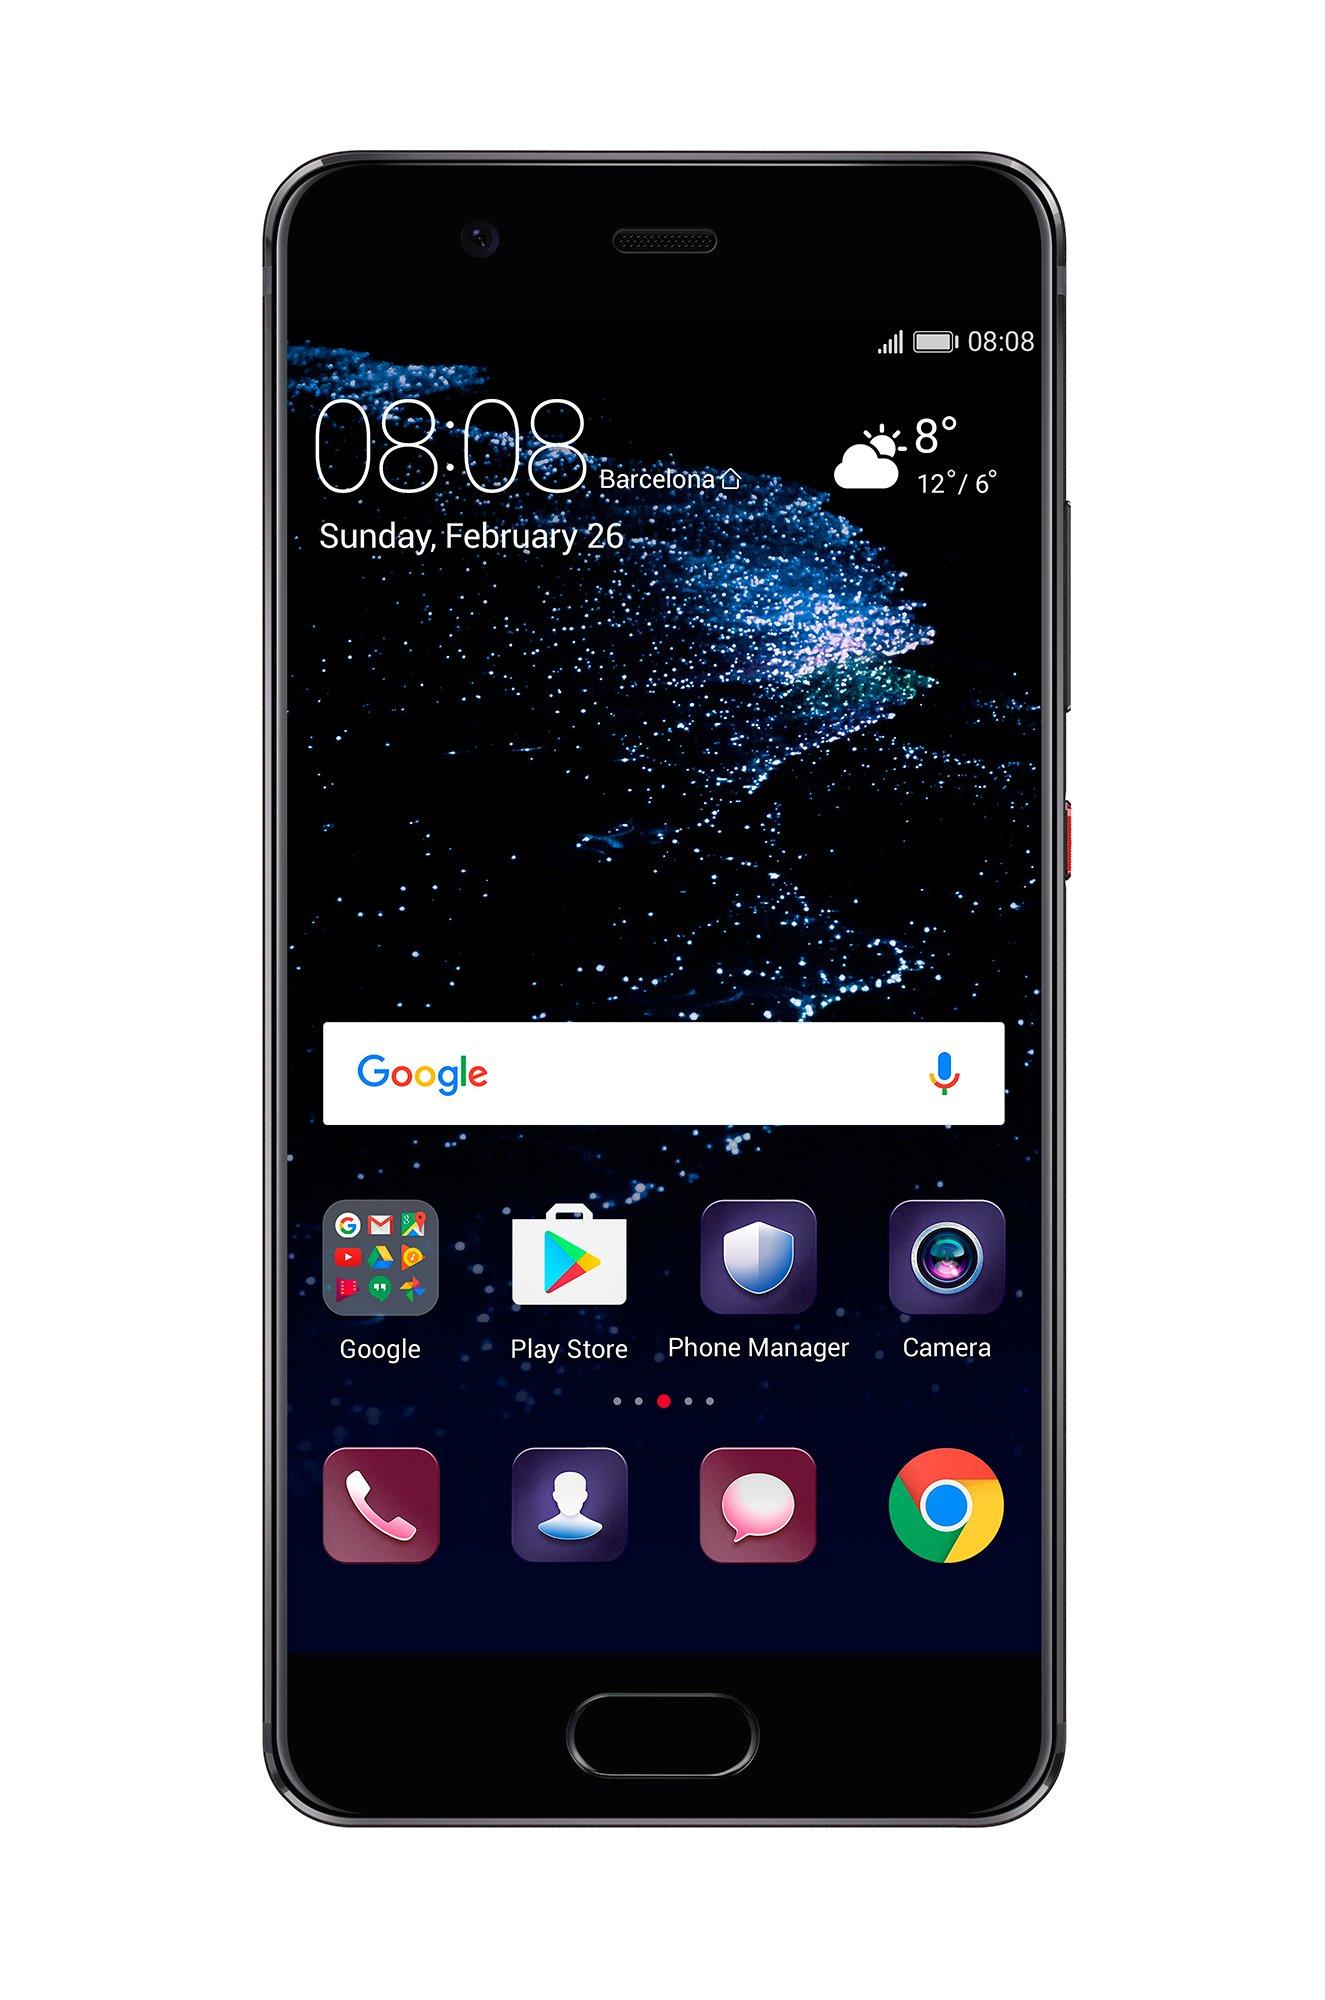 Huawei P10 VTR-L29 64GB Graphite Black, 5.1'', Dual Sim, GSM Unlocked International Model, No Warranty